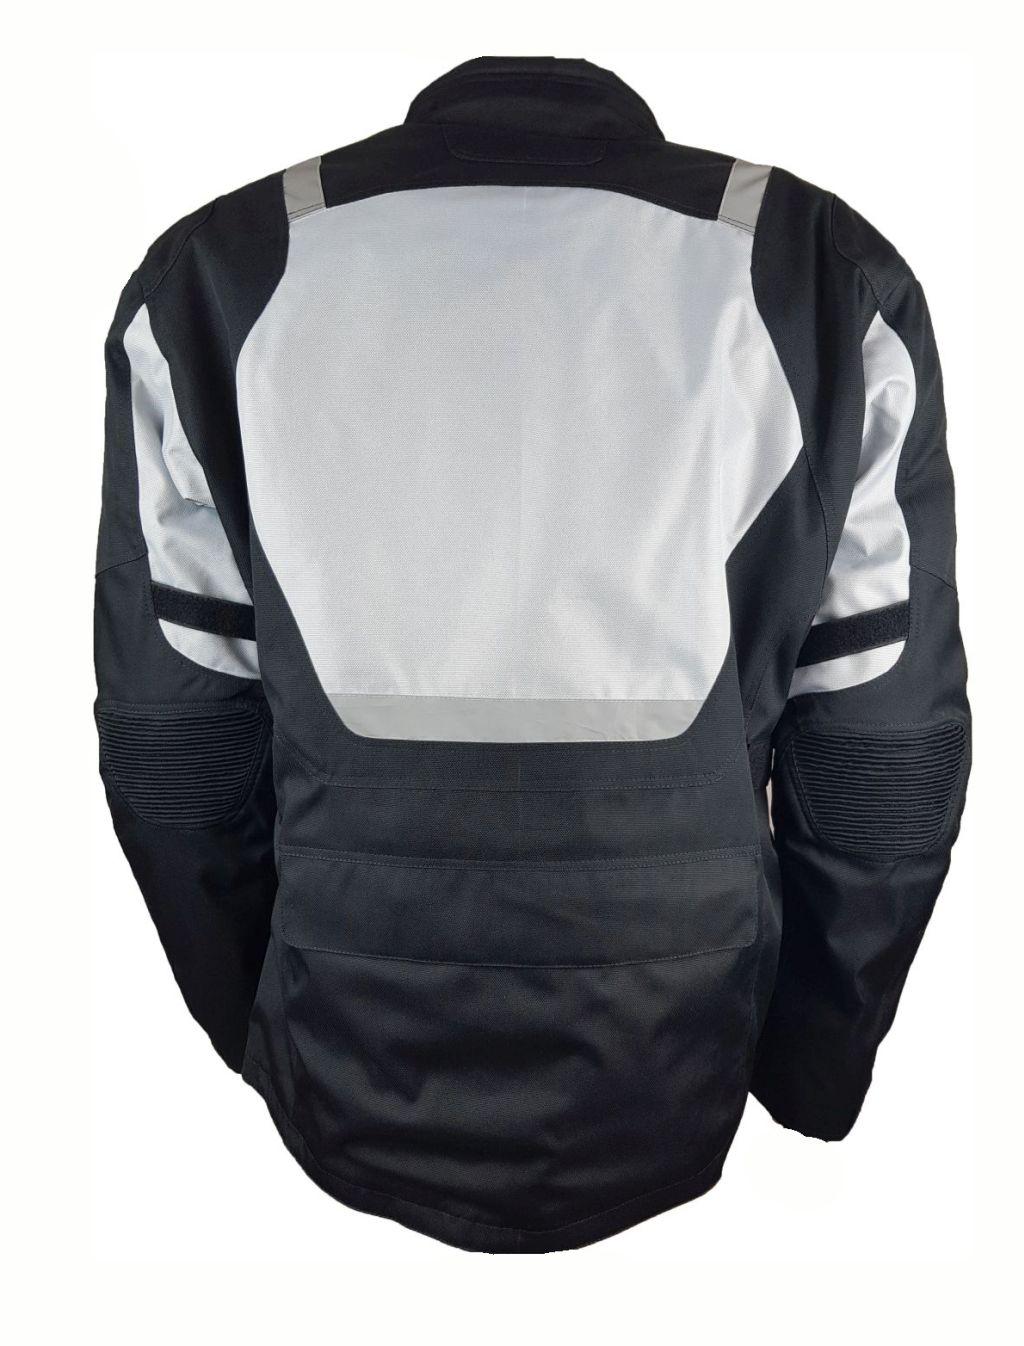 Bangla Motorrad Jacke Motorradjacke Textil Protektor schwarz grau Gr. L